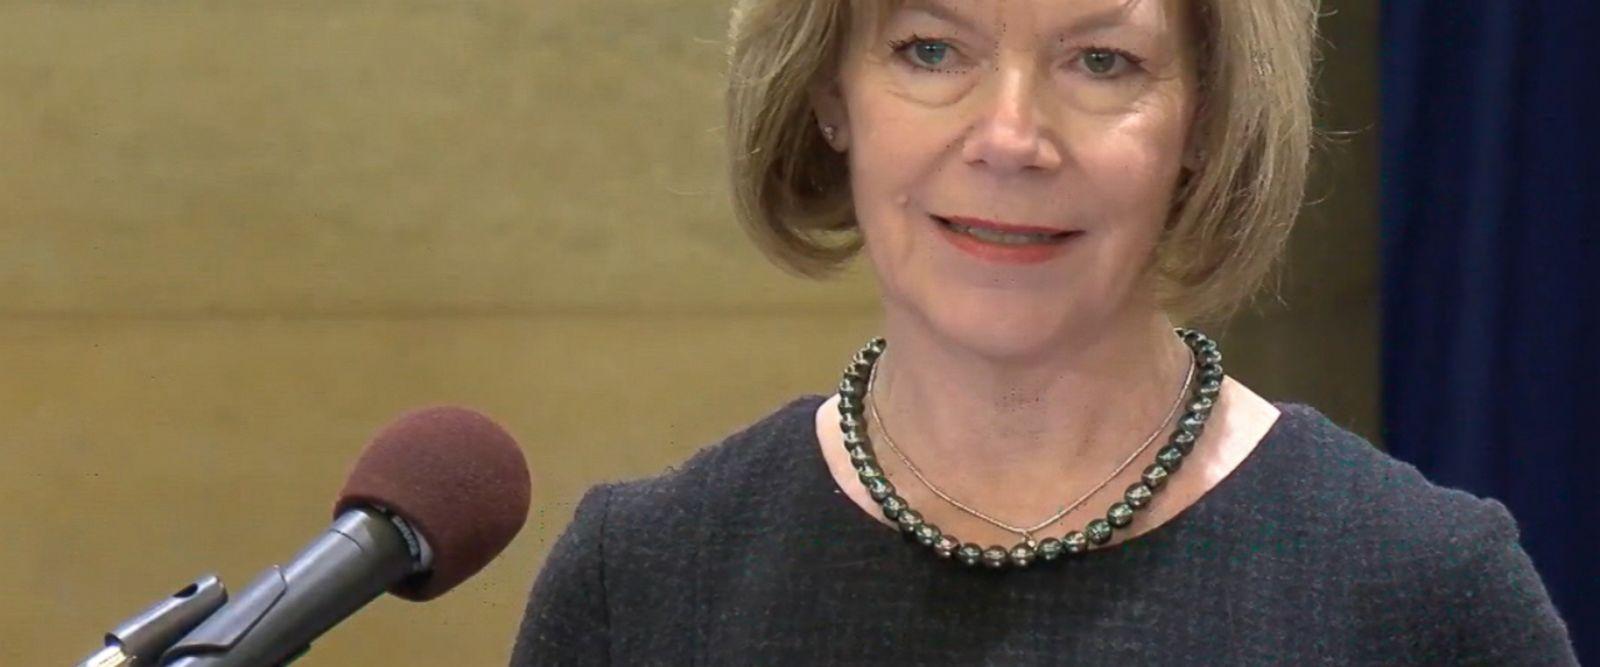 The lieutenant governor from Minnesota was chosen to fill Al Franken's Senate seat.